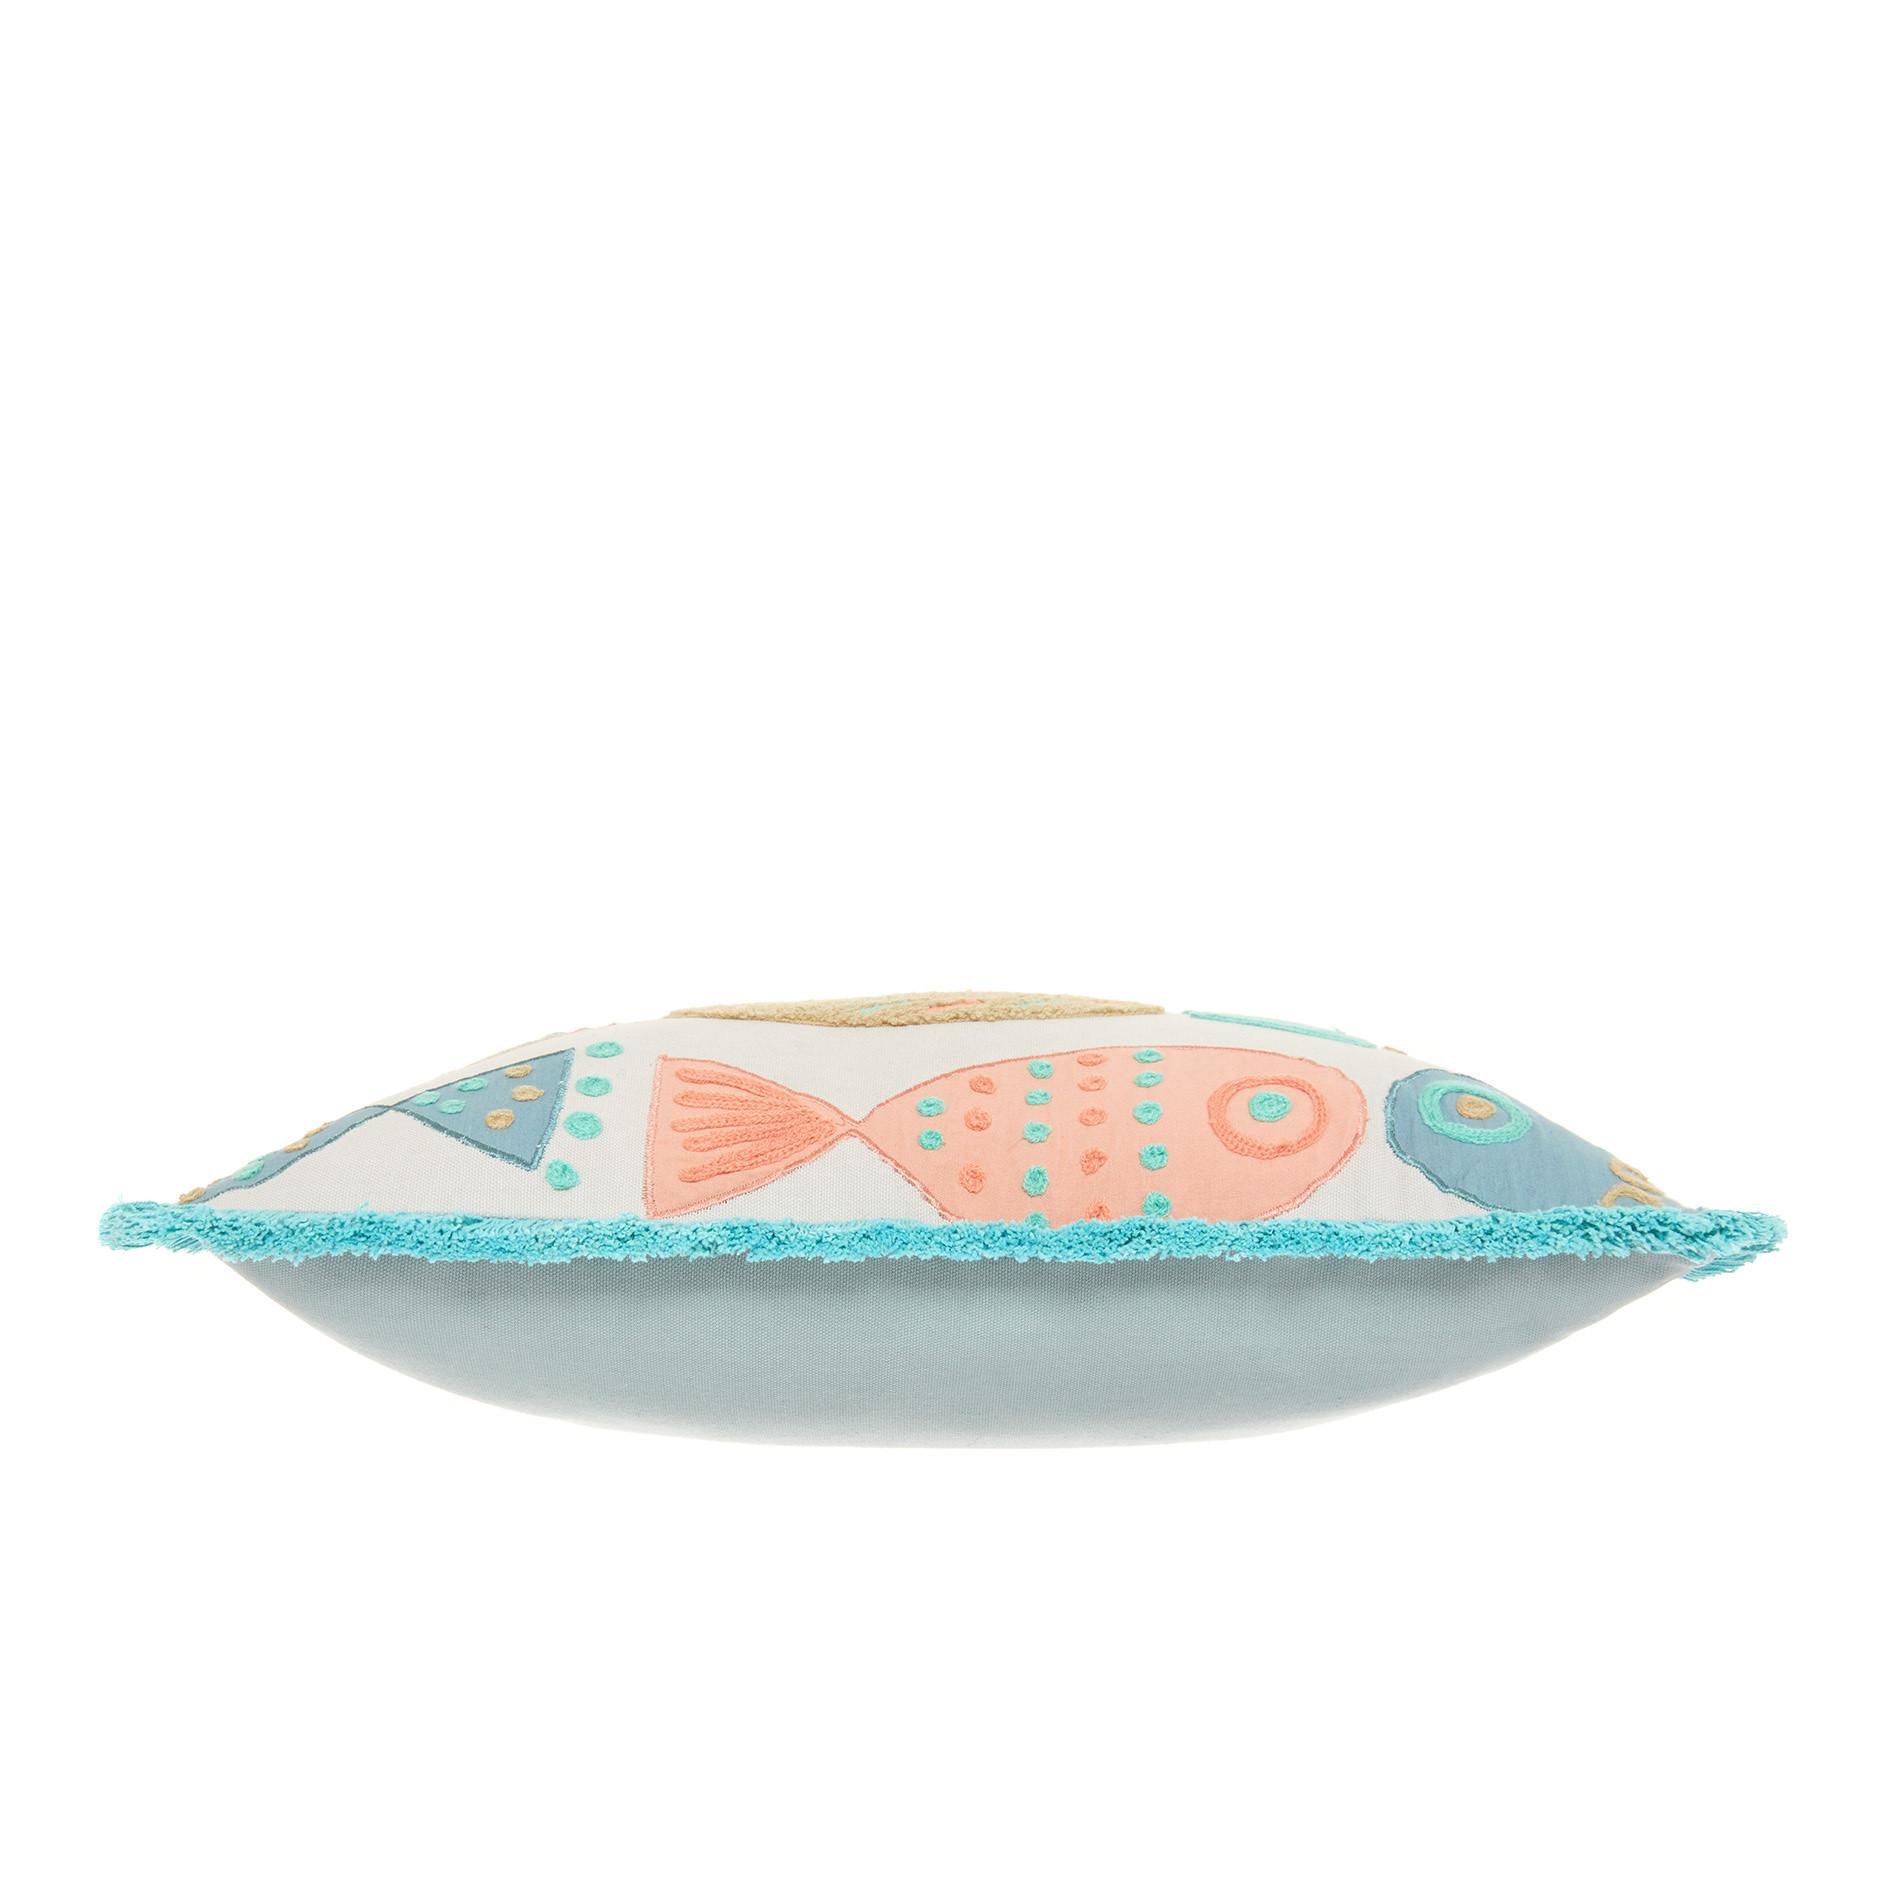 Cuscino ricamo pesci 45x45cm, Bianco, large image number 2